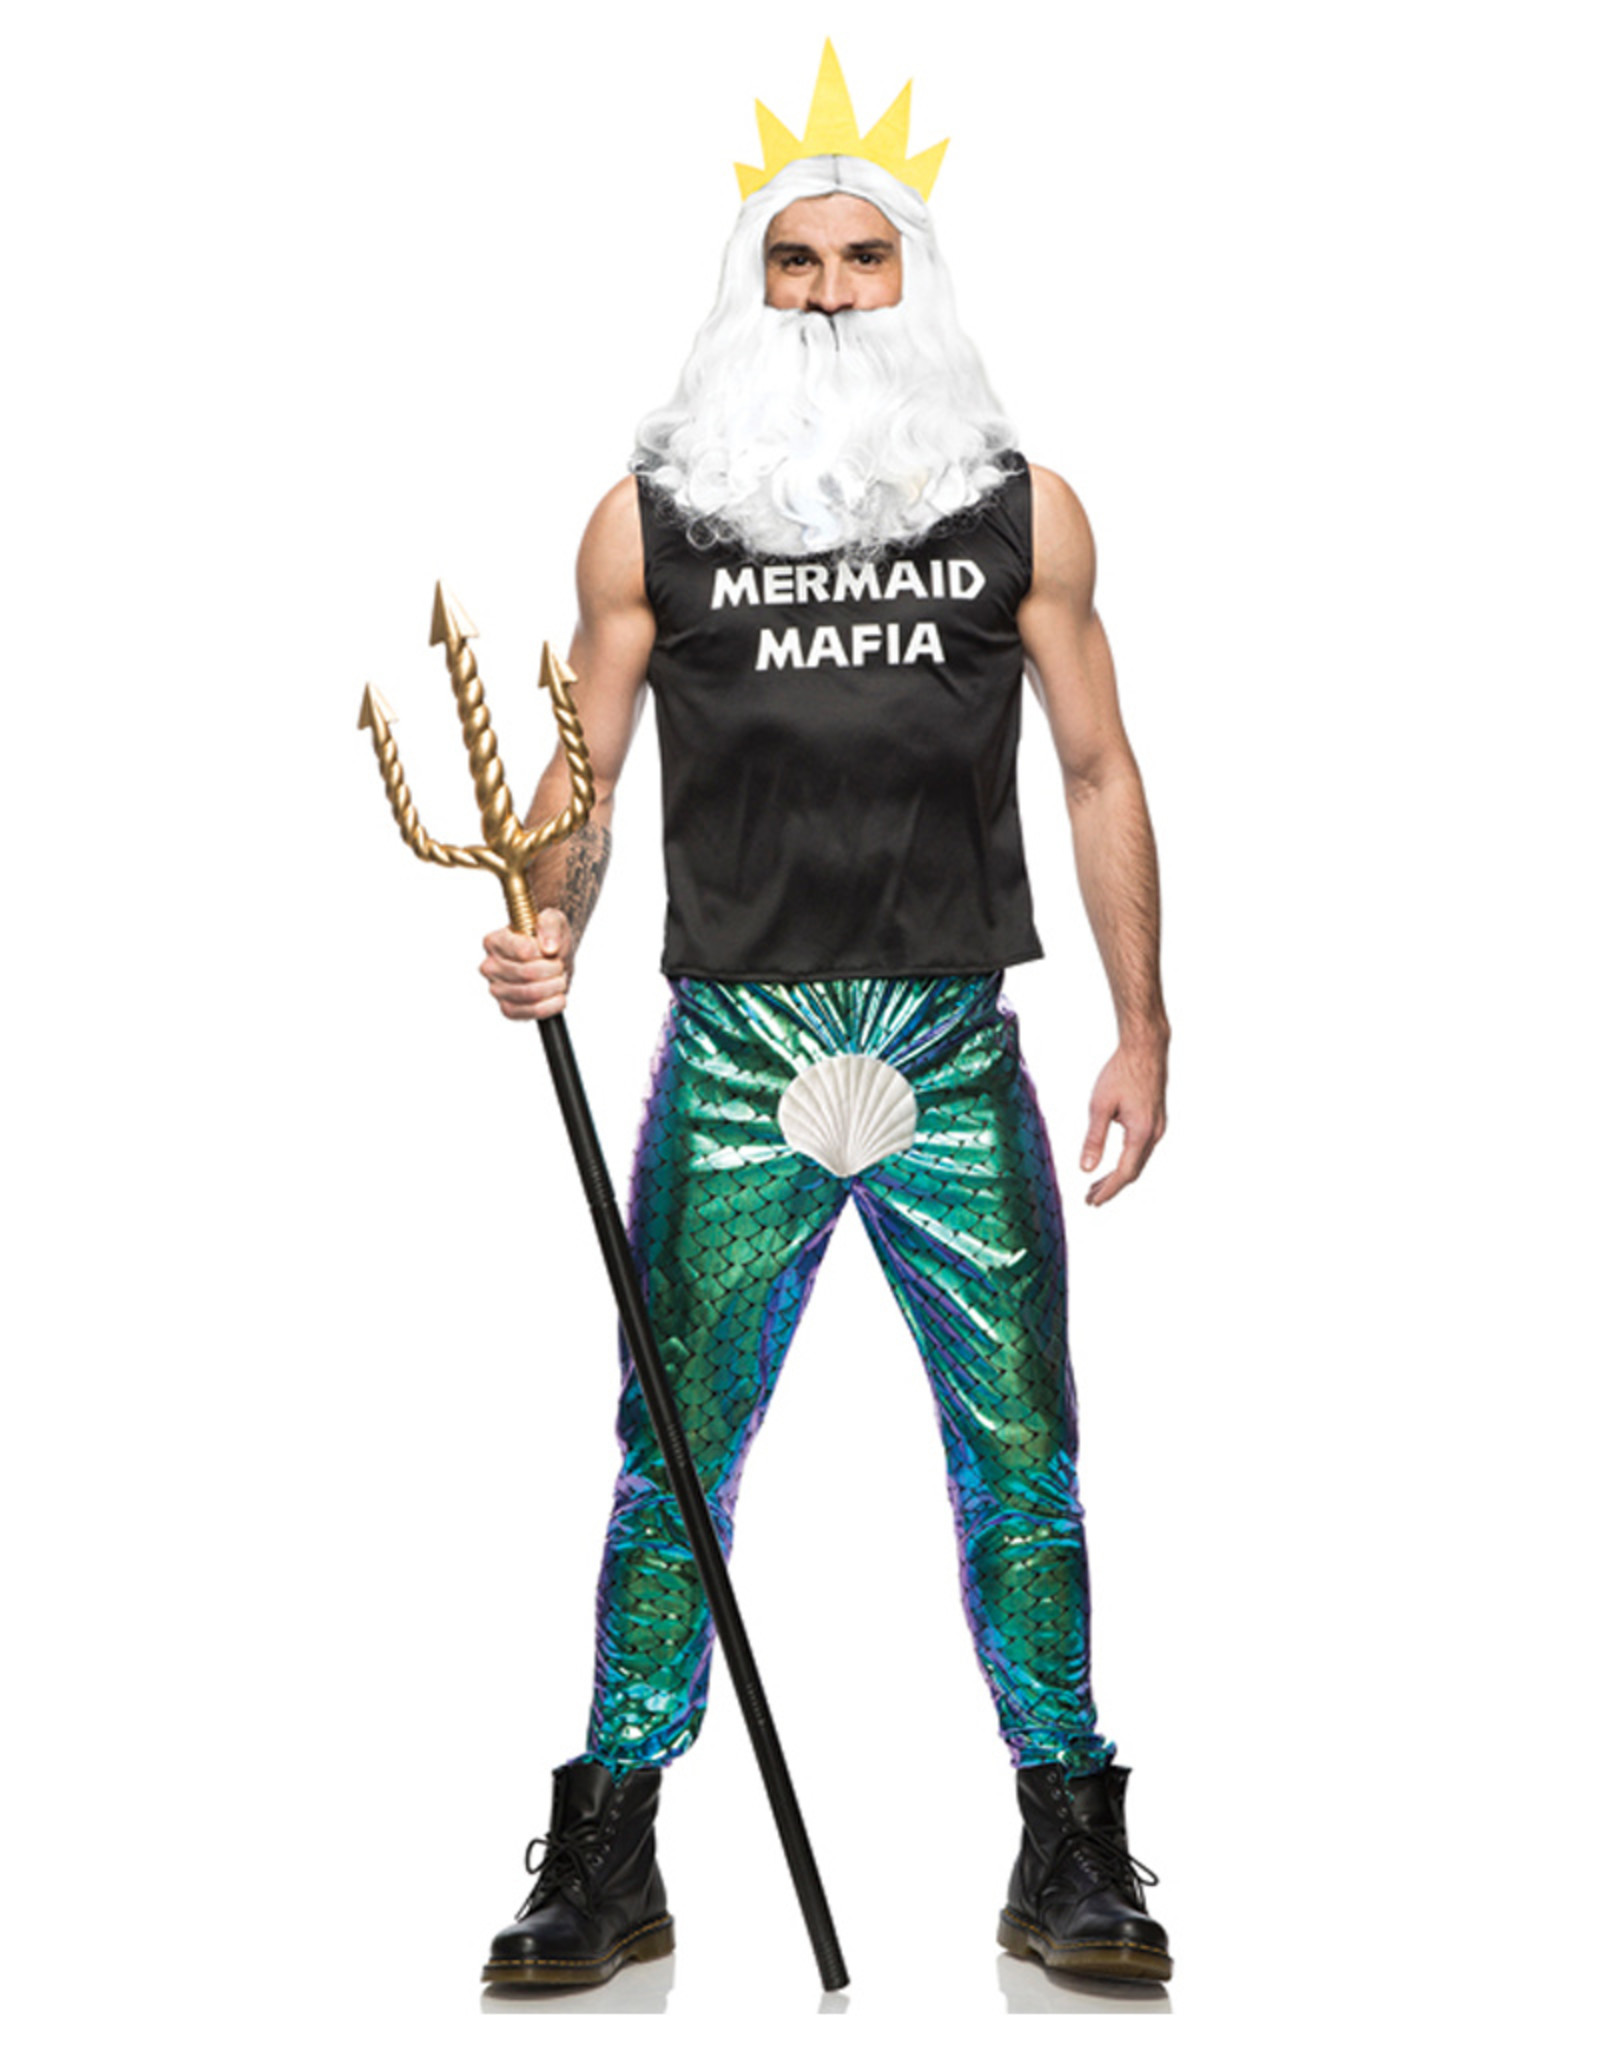 Mermaid Mafia Costume - Humor